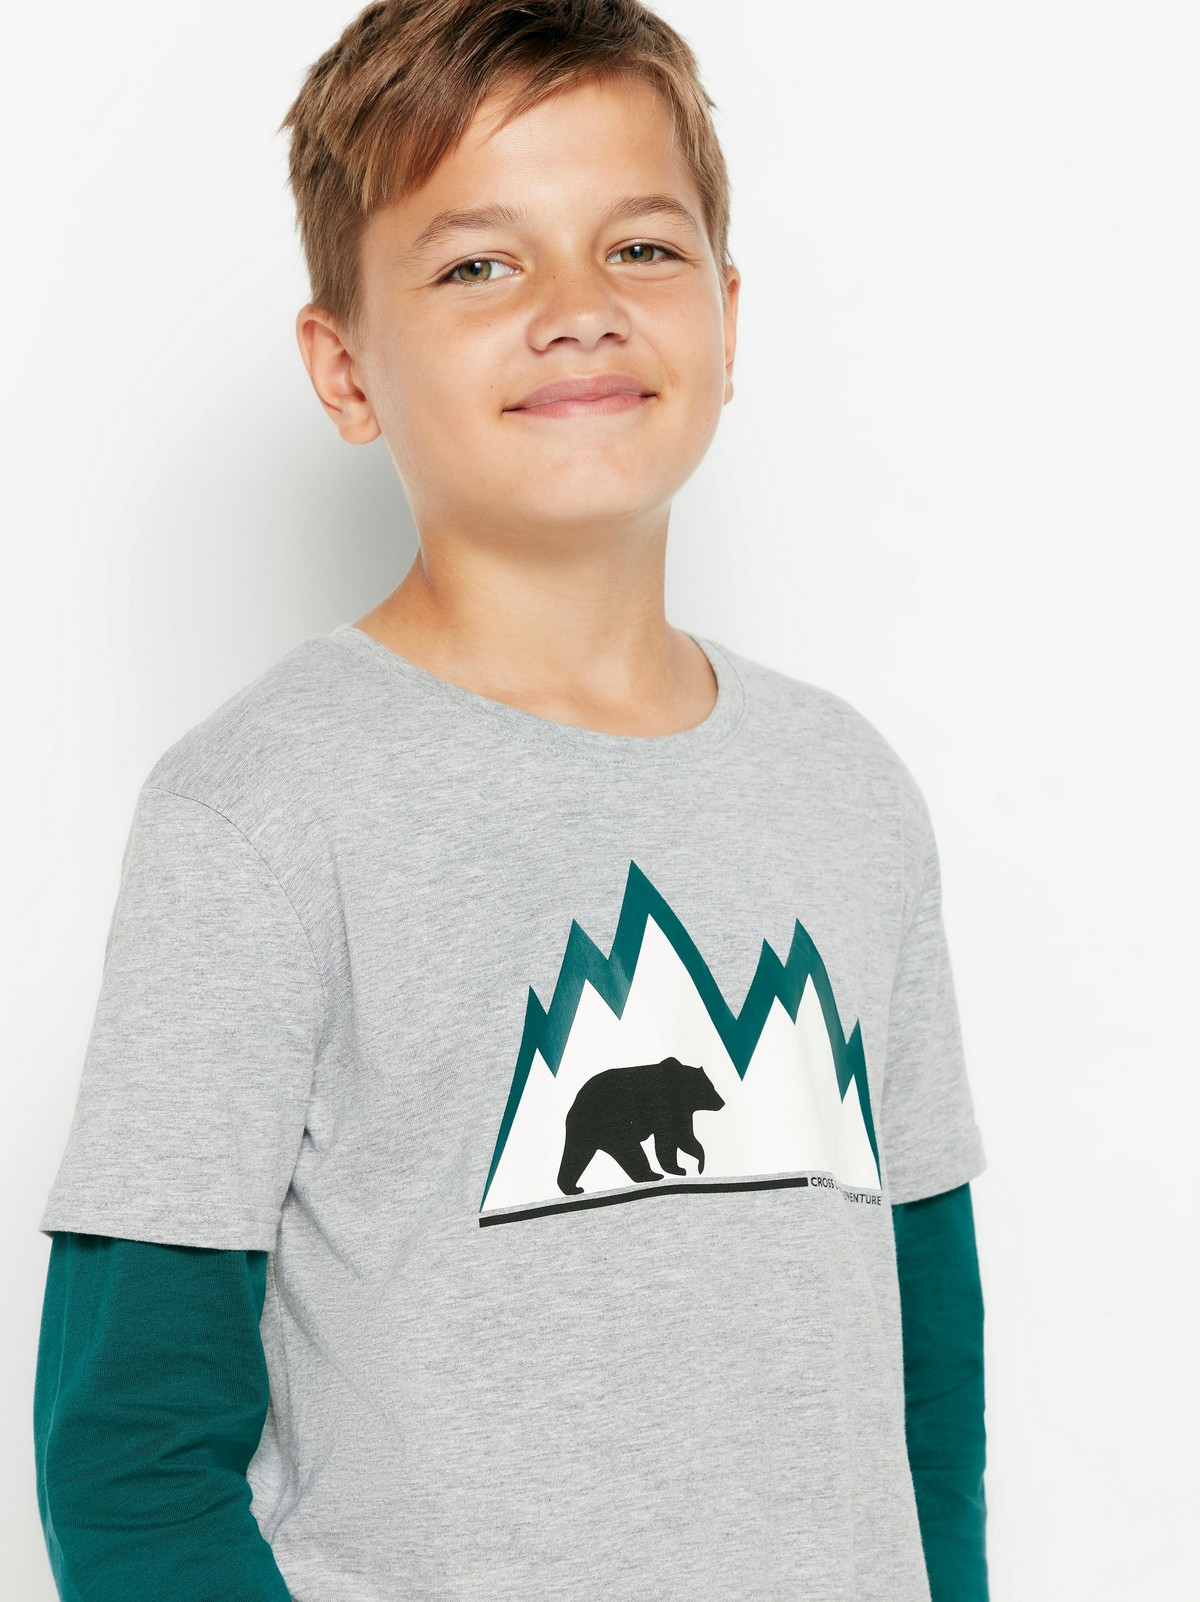 Advice From a Polar Bear T-Shirt YOUTH Large NWT